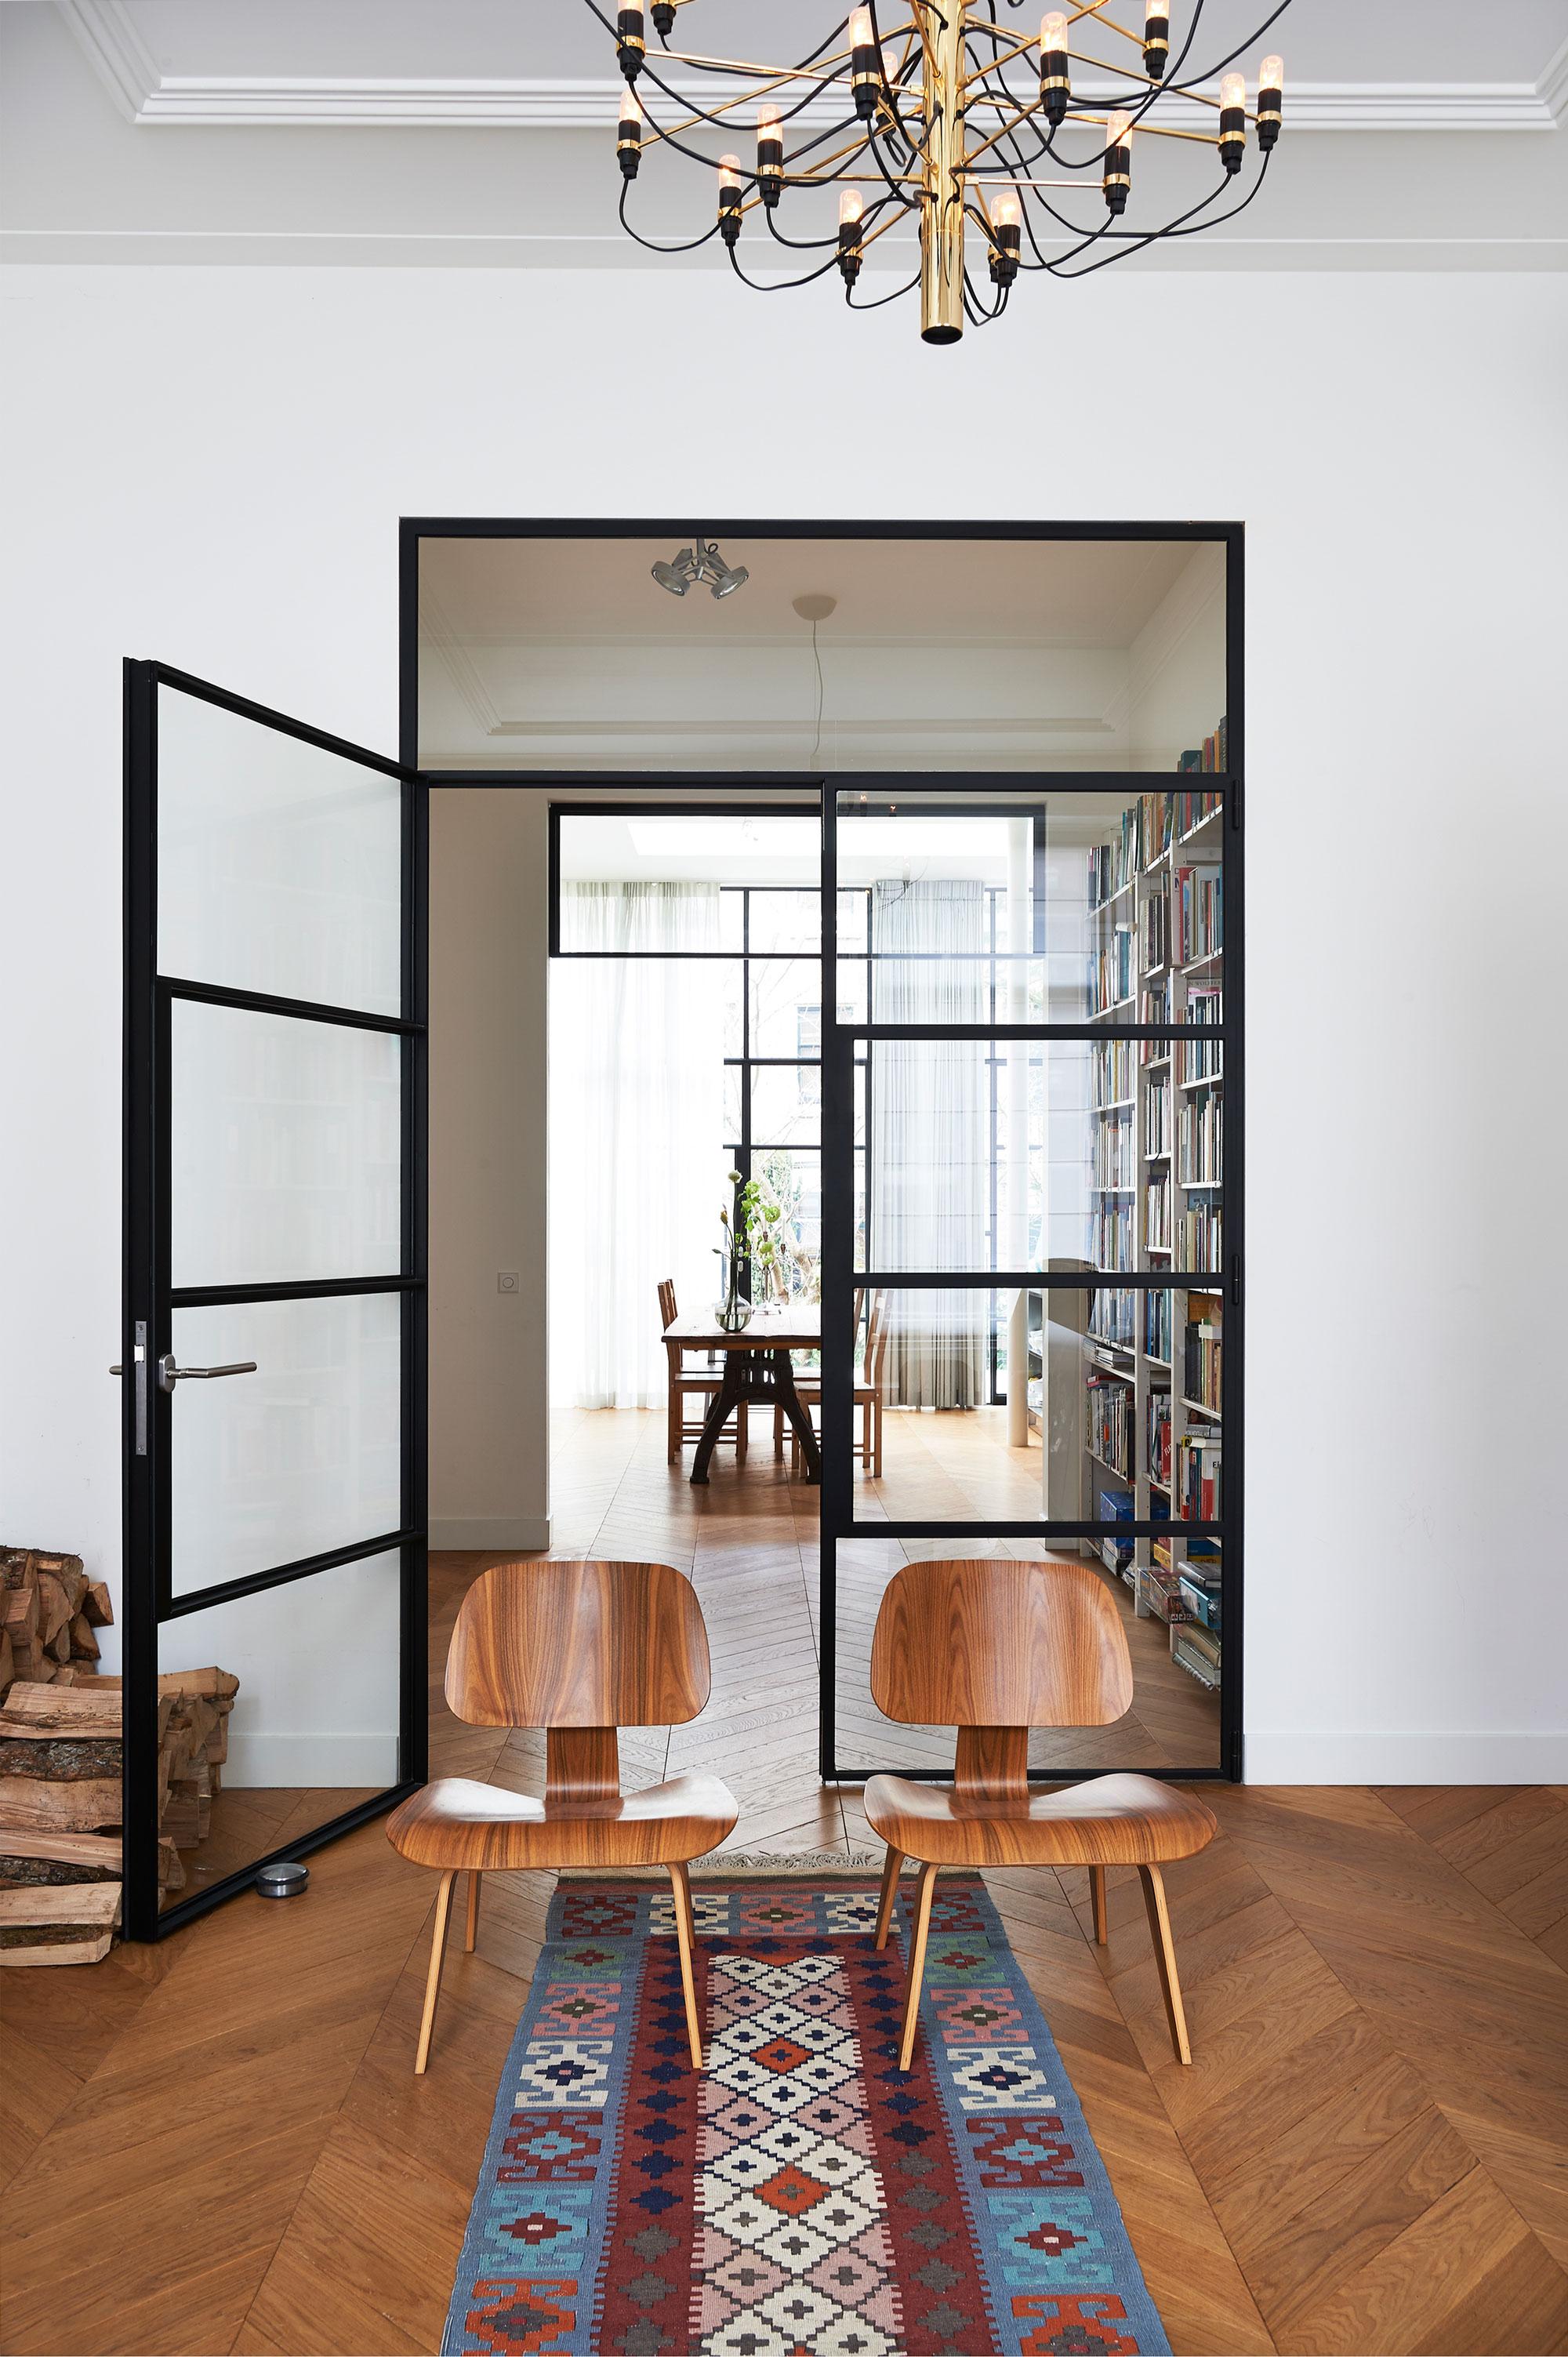 Projecten VASD interieur & architectuur